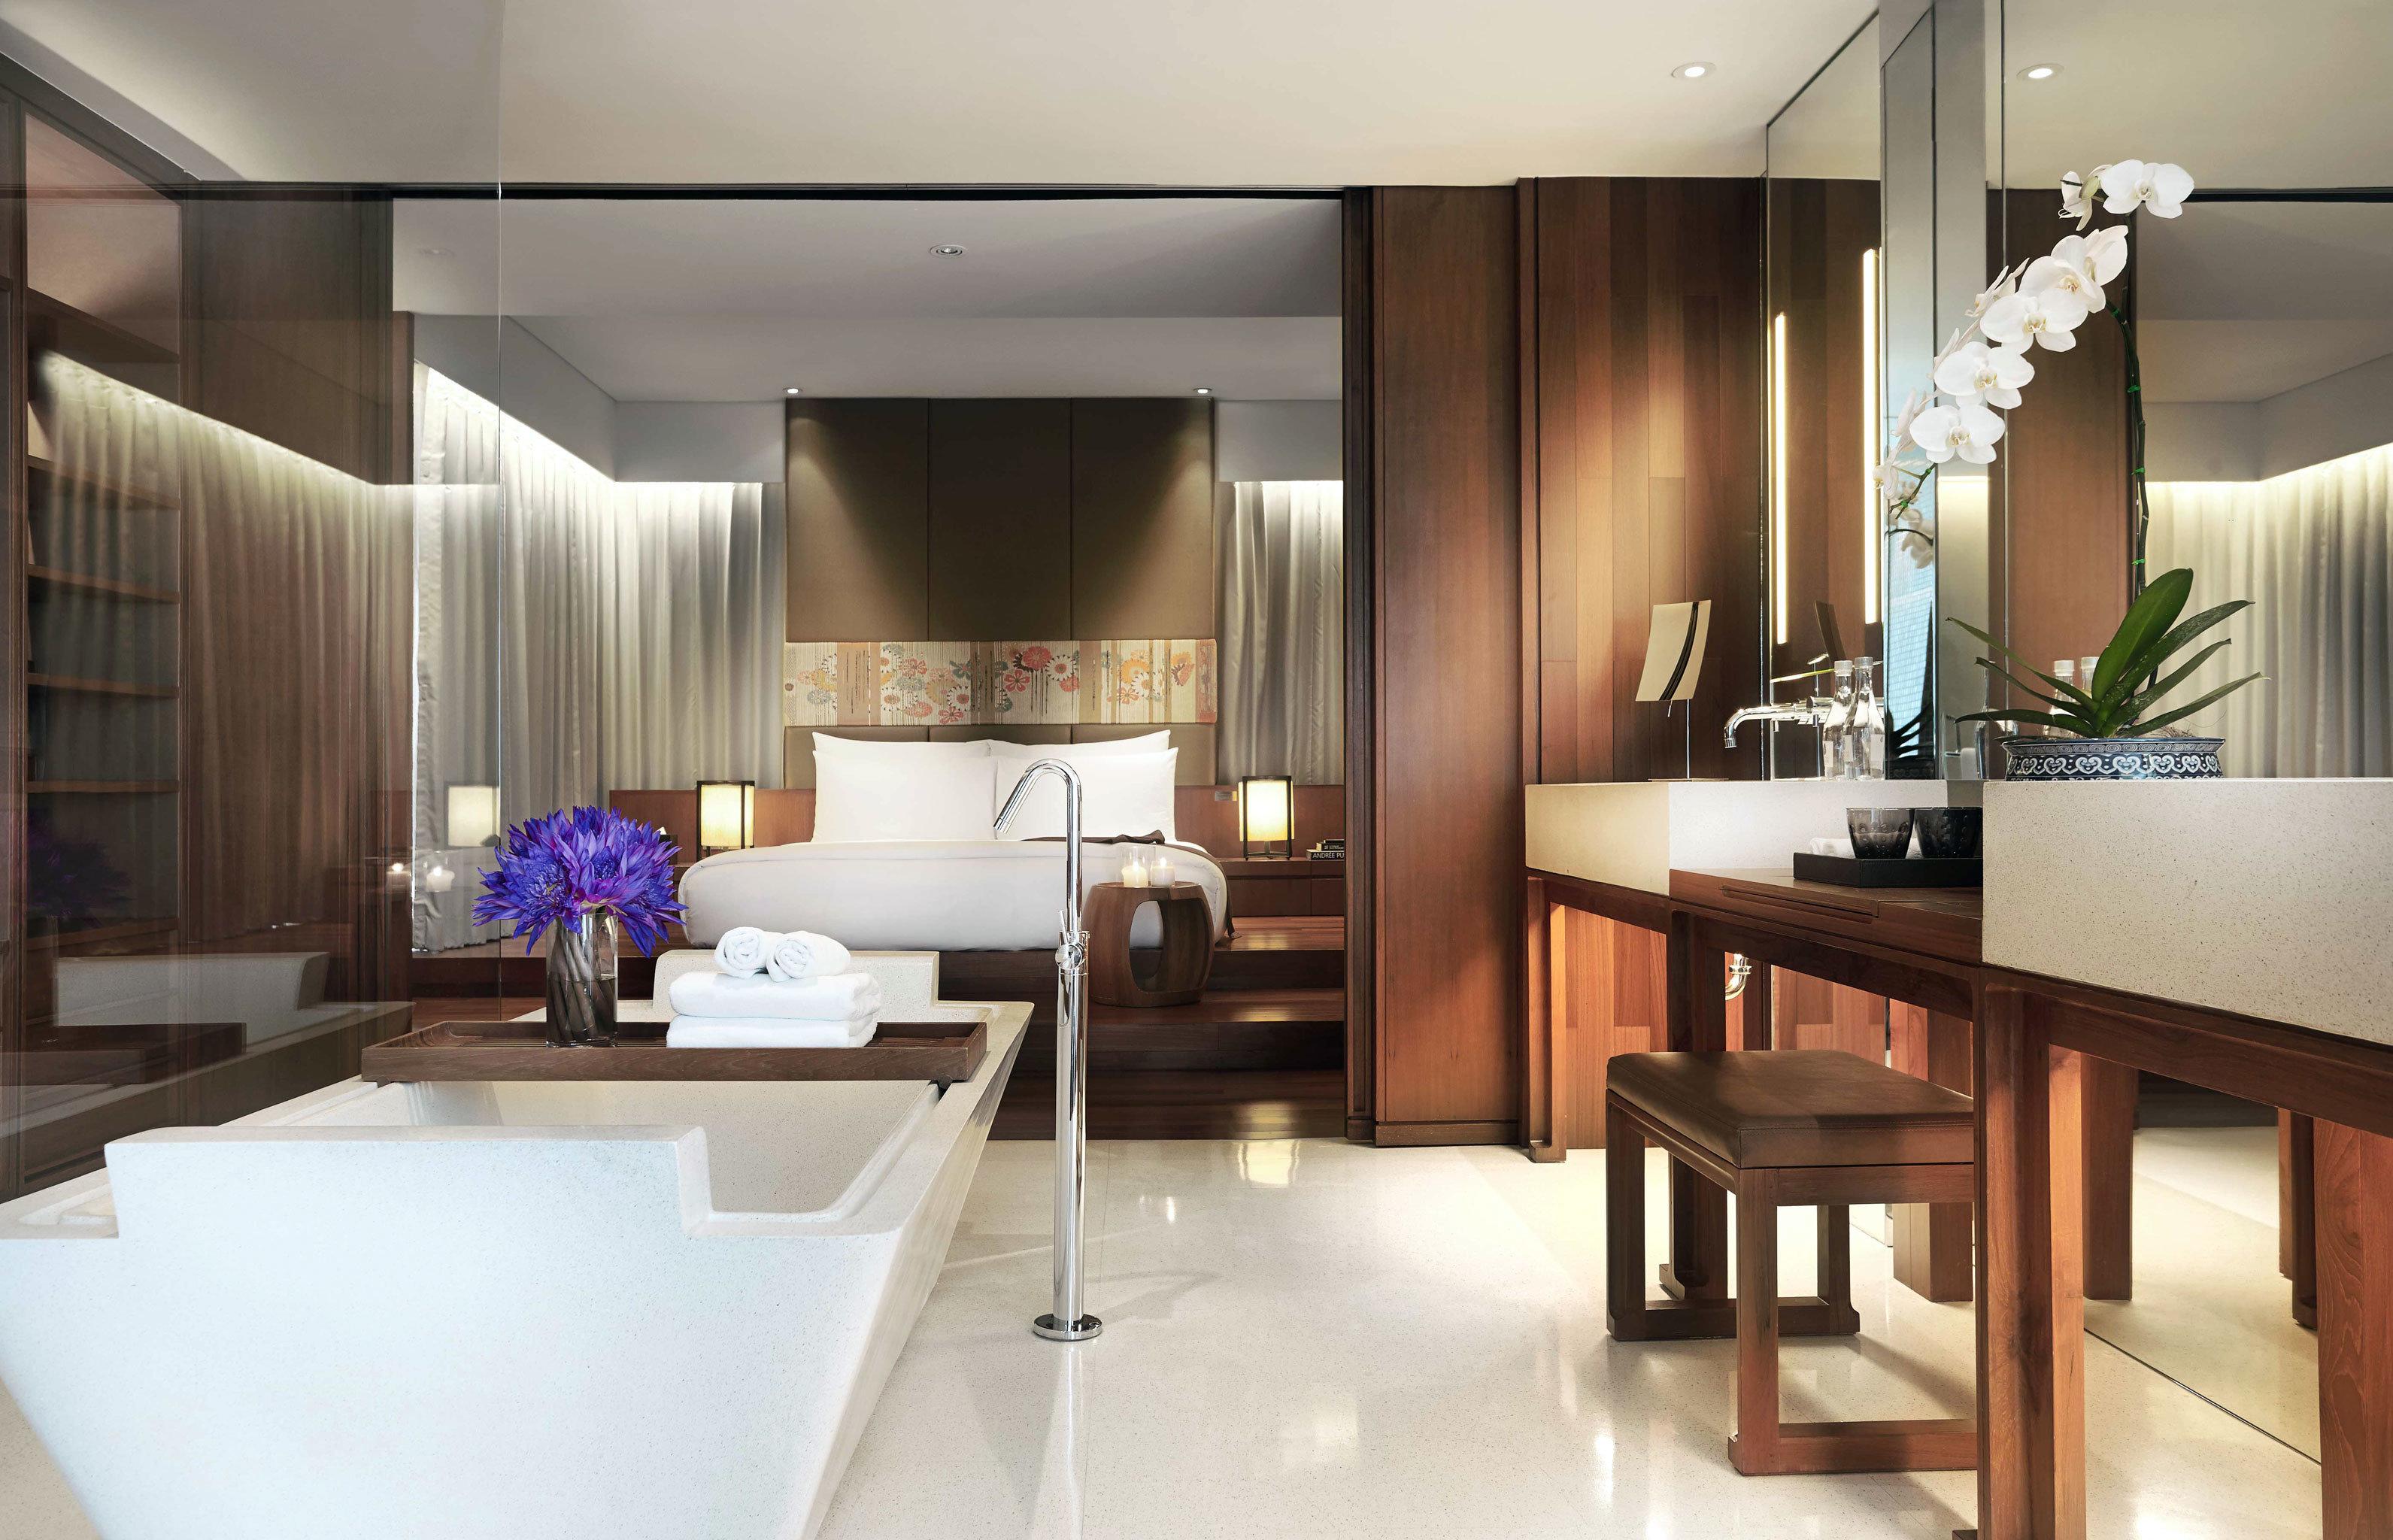 Bath Luxury Modern property condominium Suite lighting home living room dining table